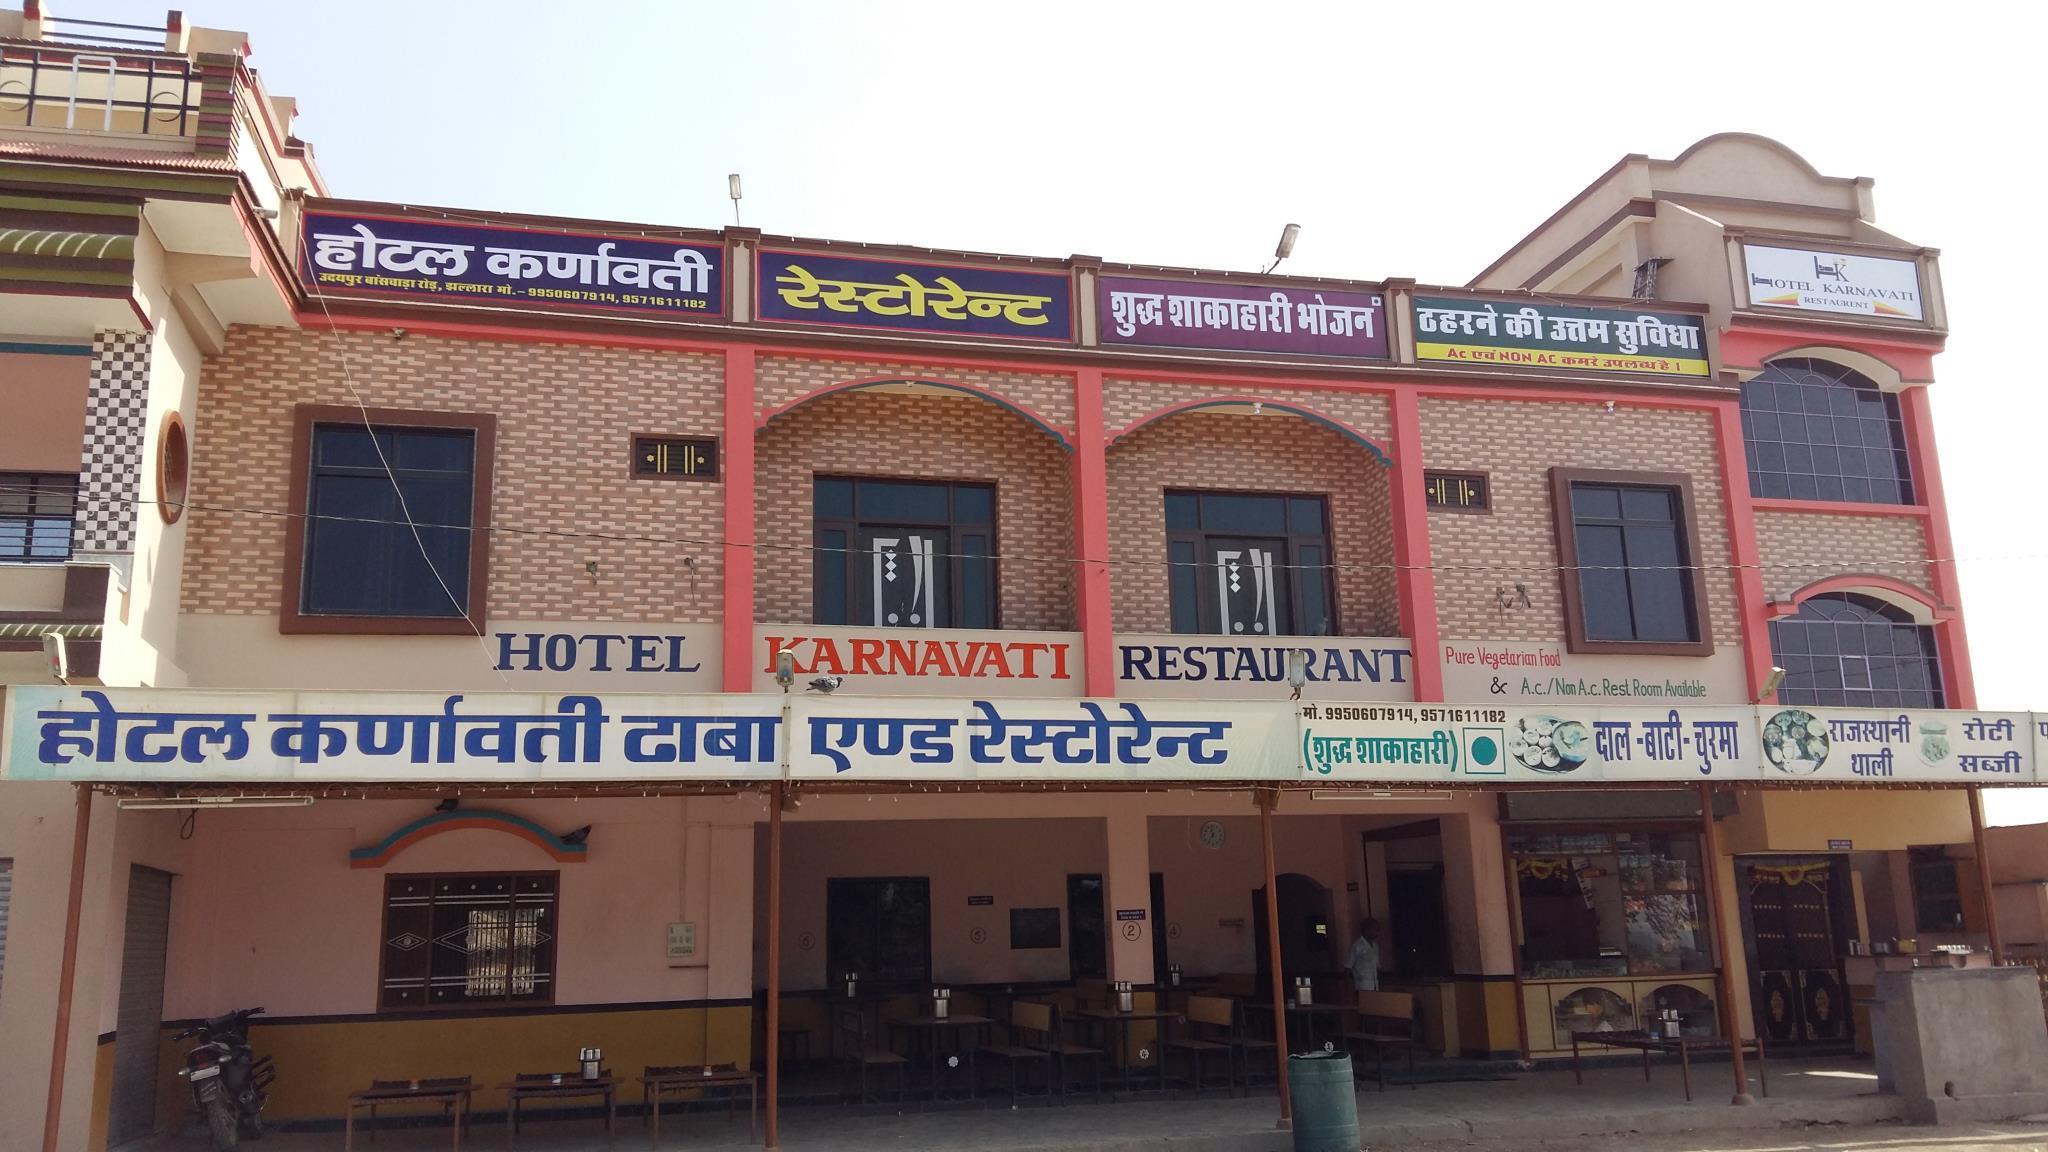 Hotel Karnavati Restaurant